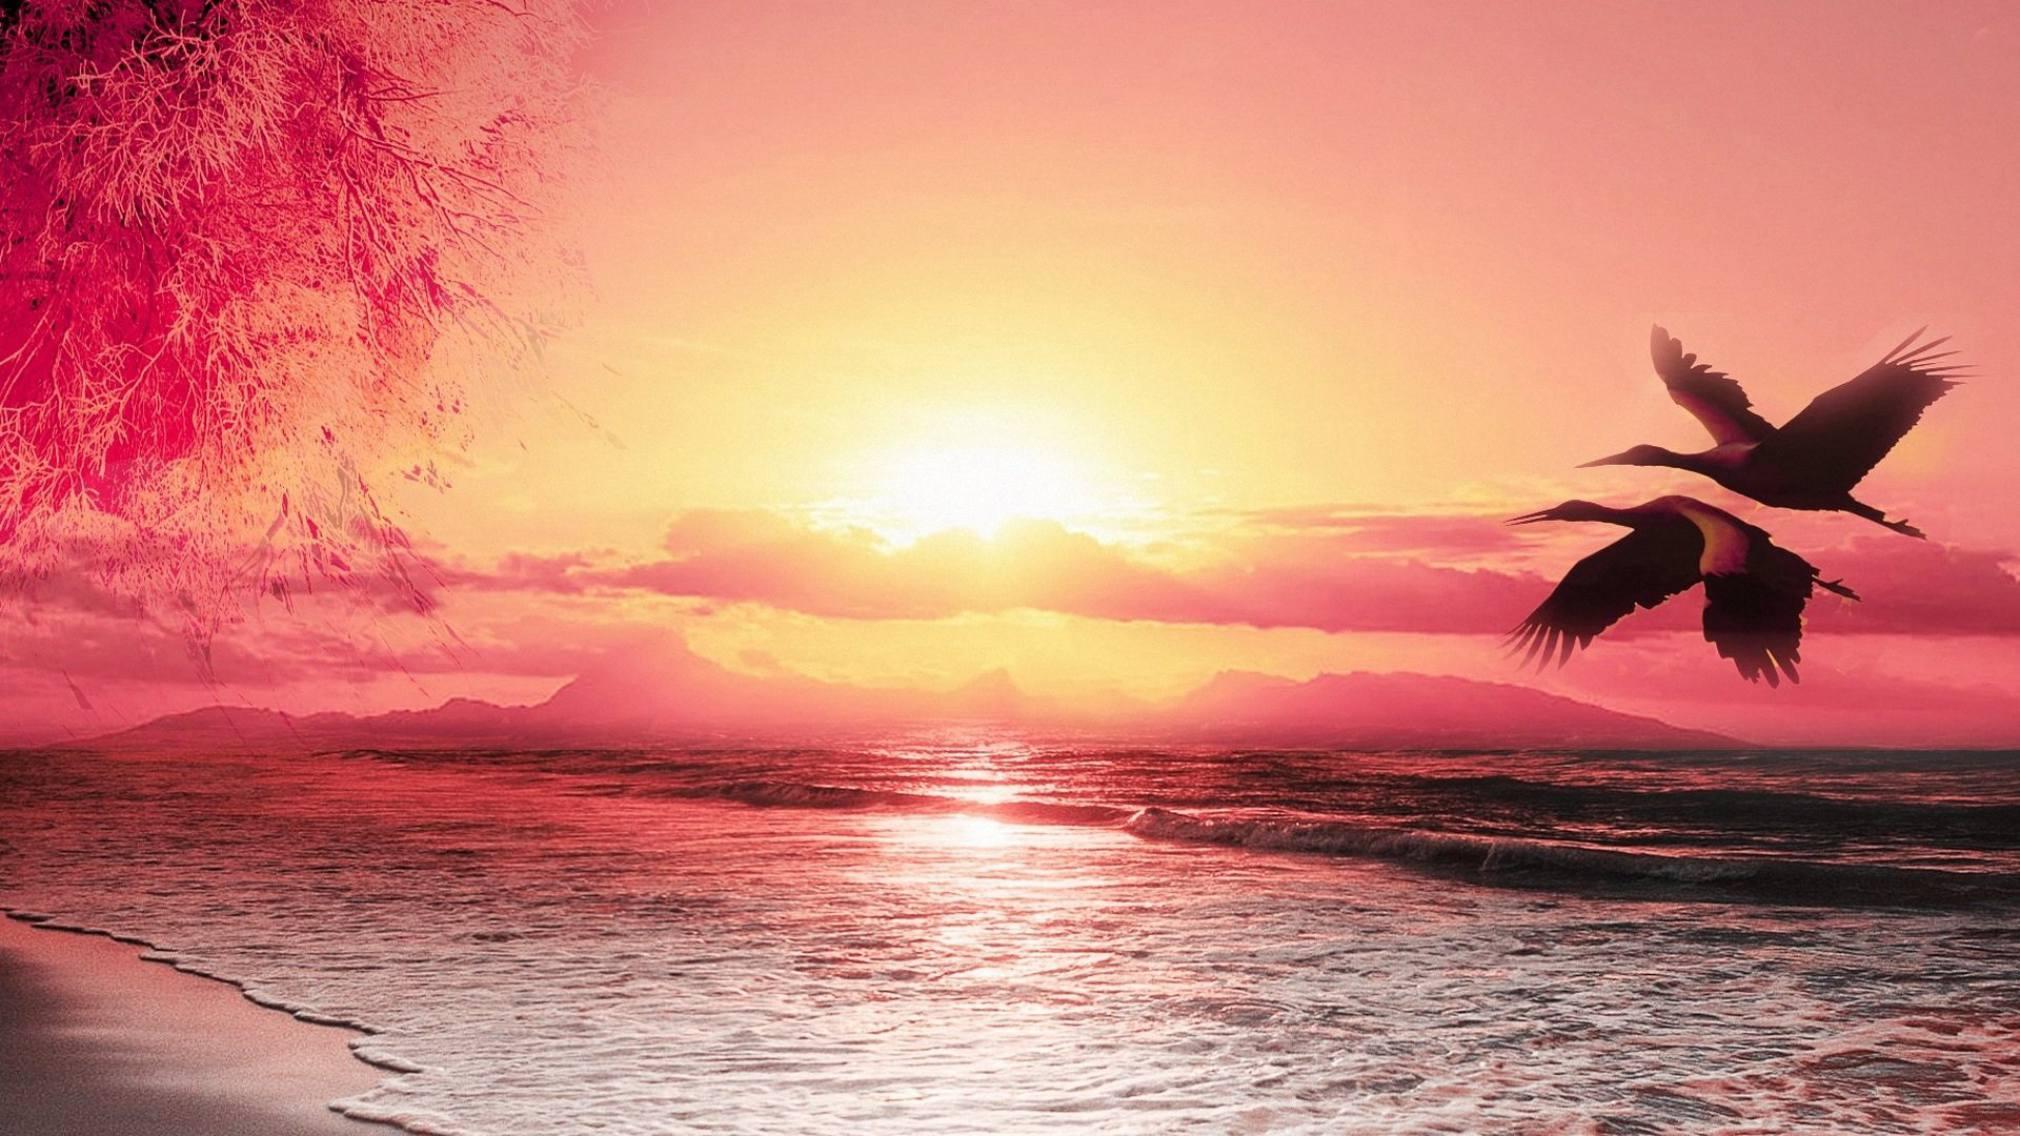 the beautiful seaside scenery - photo #30